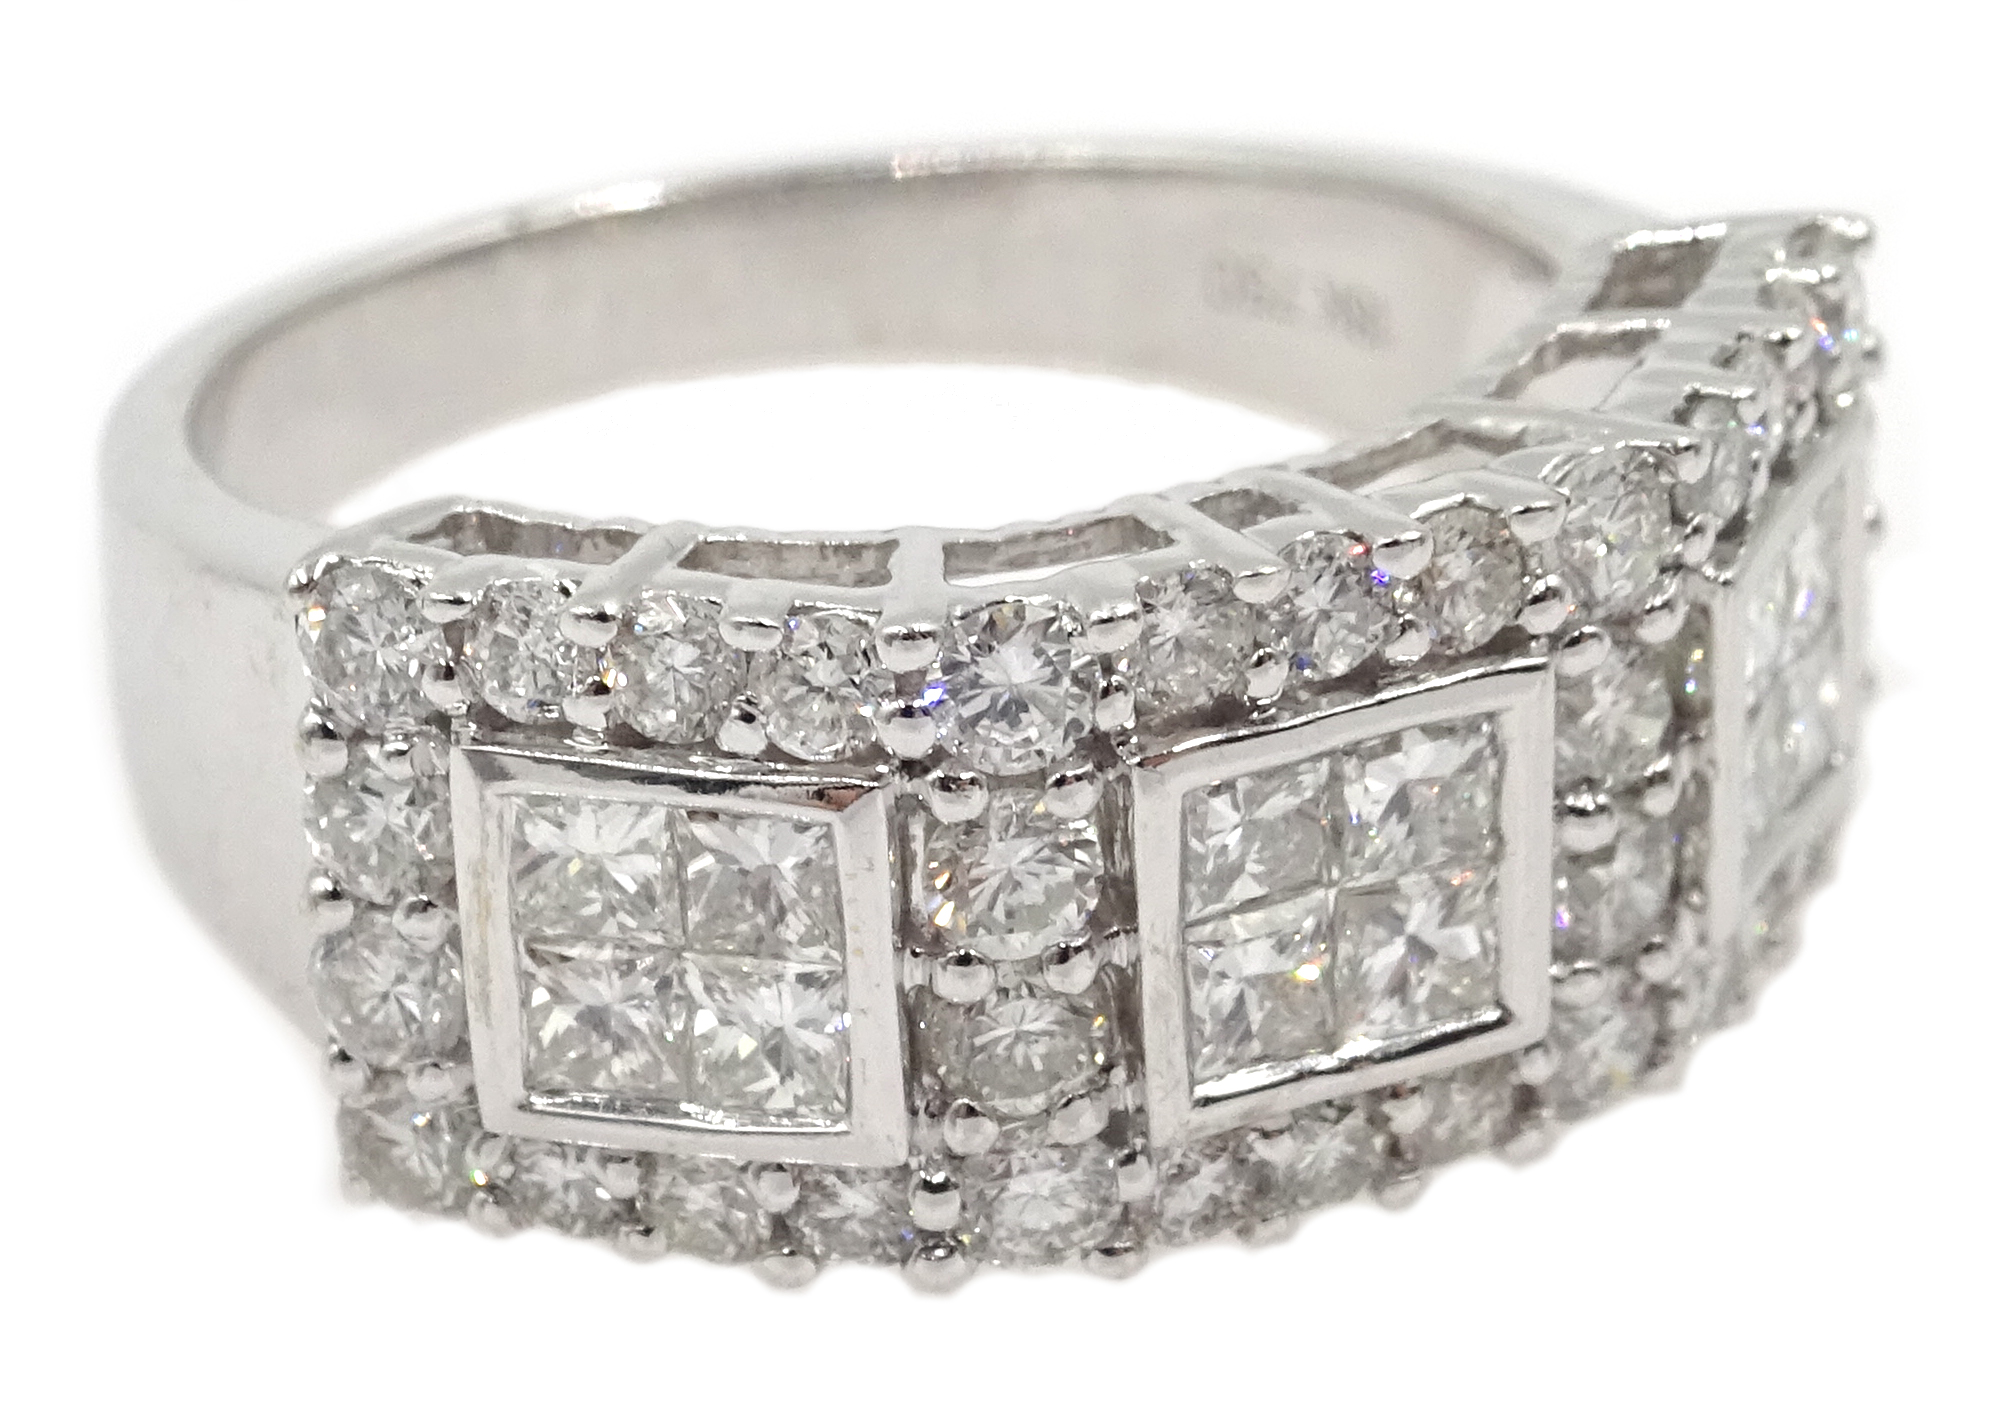 Lot 1017 - 18ct white gold princess cut and round brilliant cut diamond ring hallmarked,